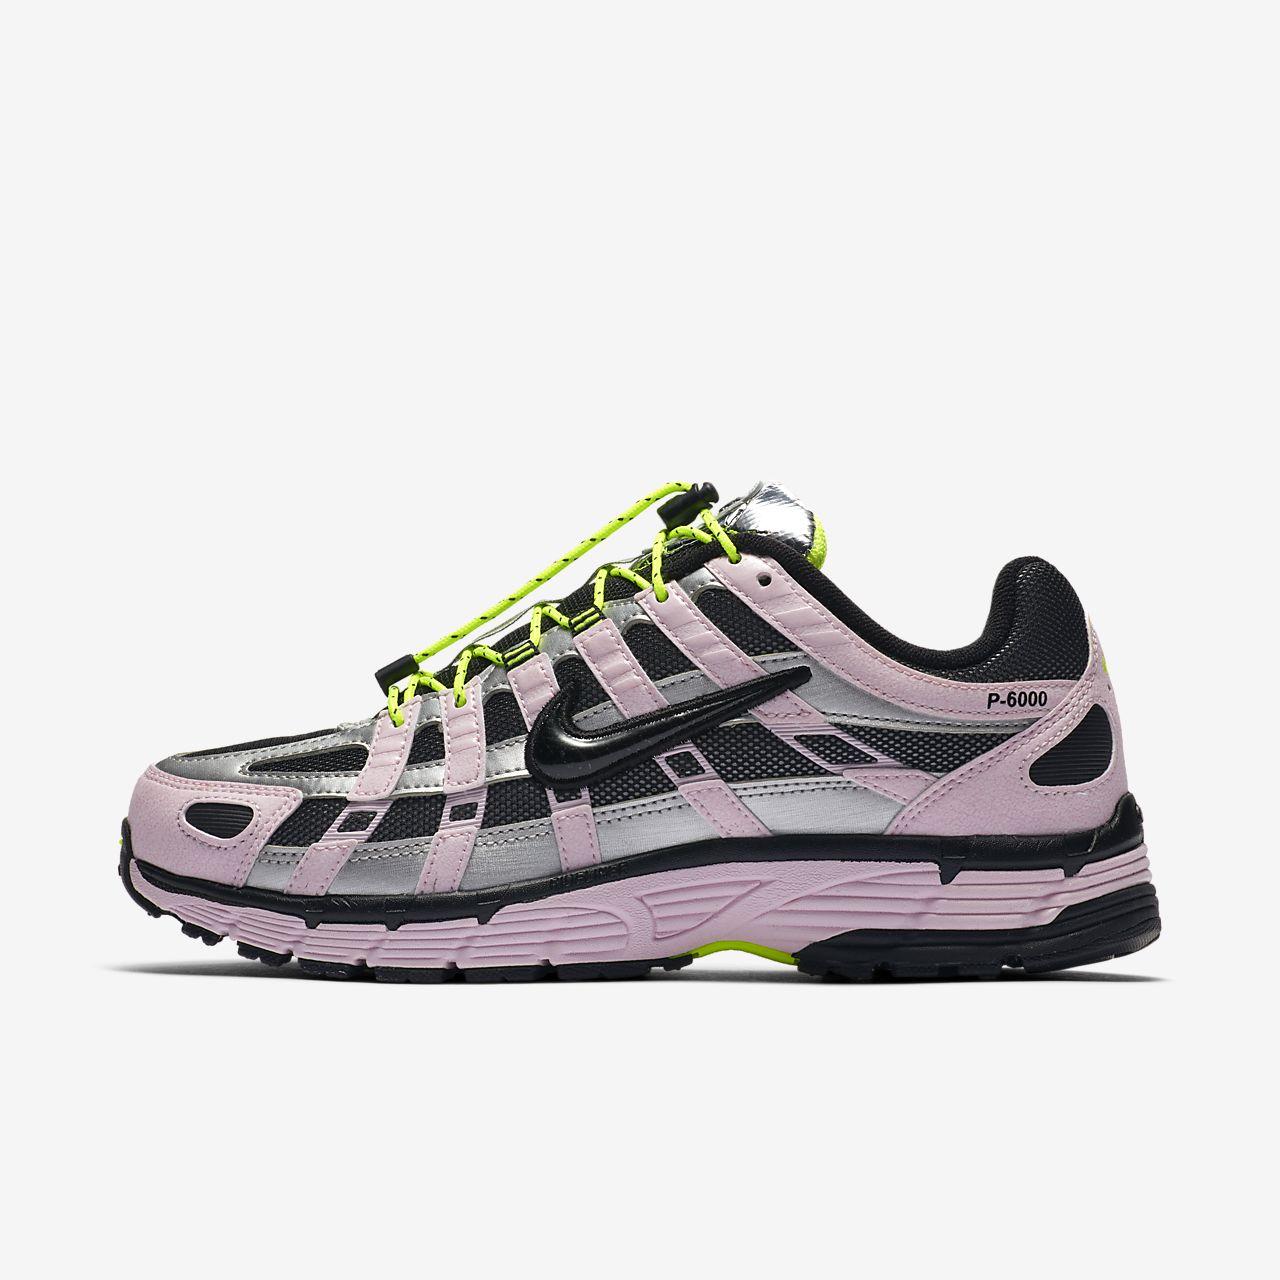 Zapatillas Nike P 6000 de malla